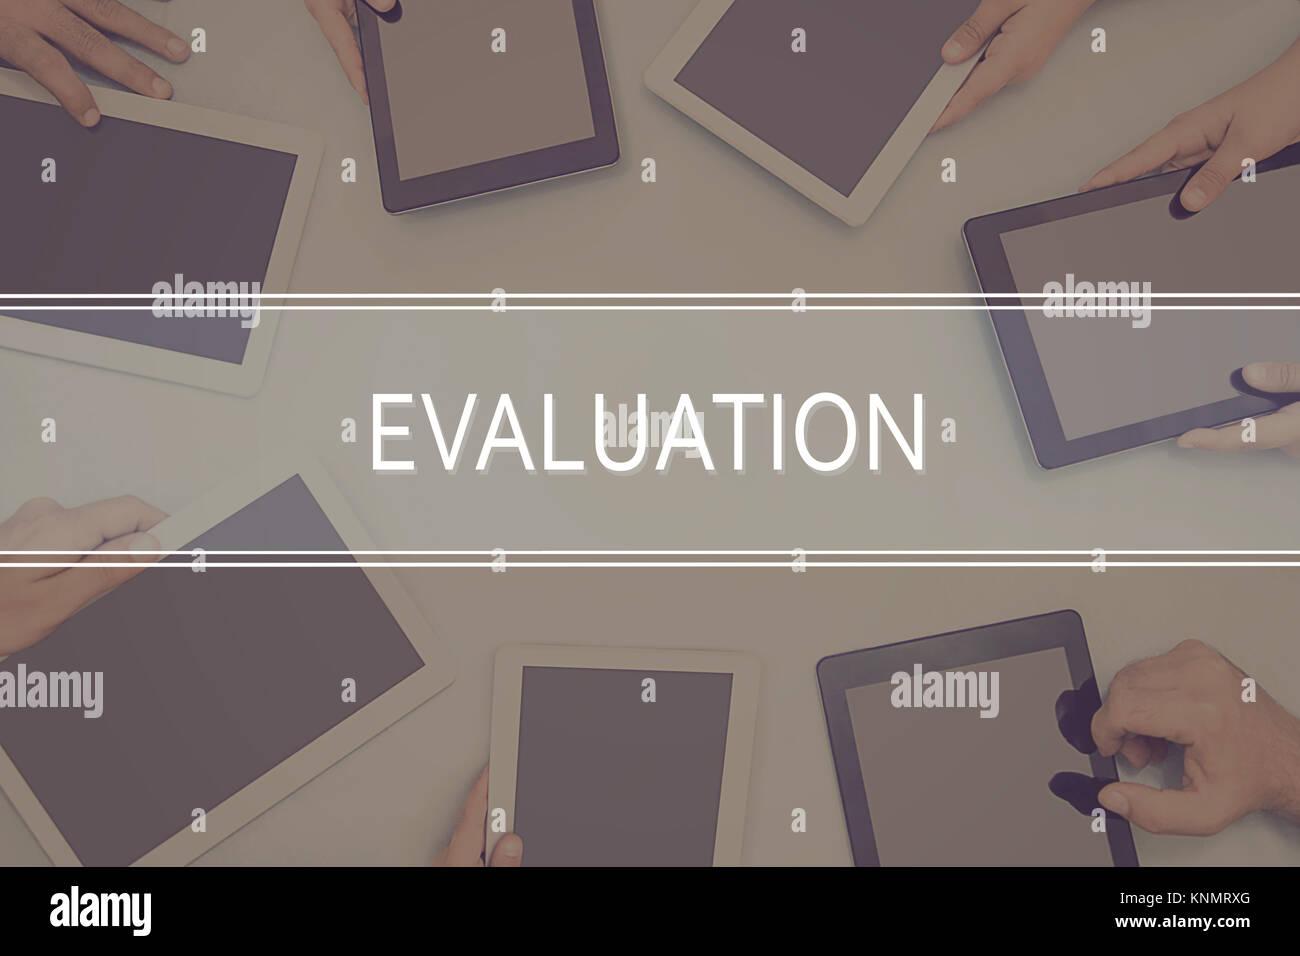 EVALUATION CONCEPT Business Concept. - Stock Image